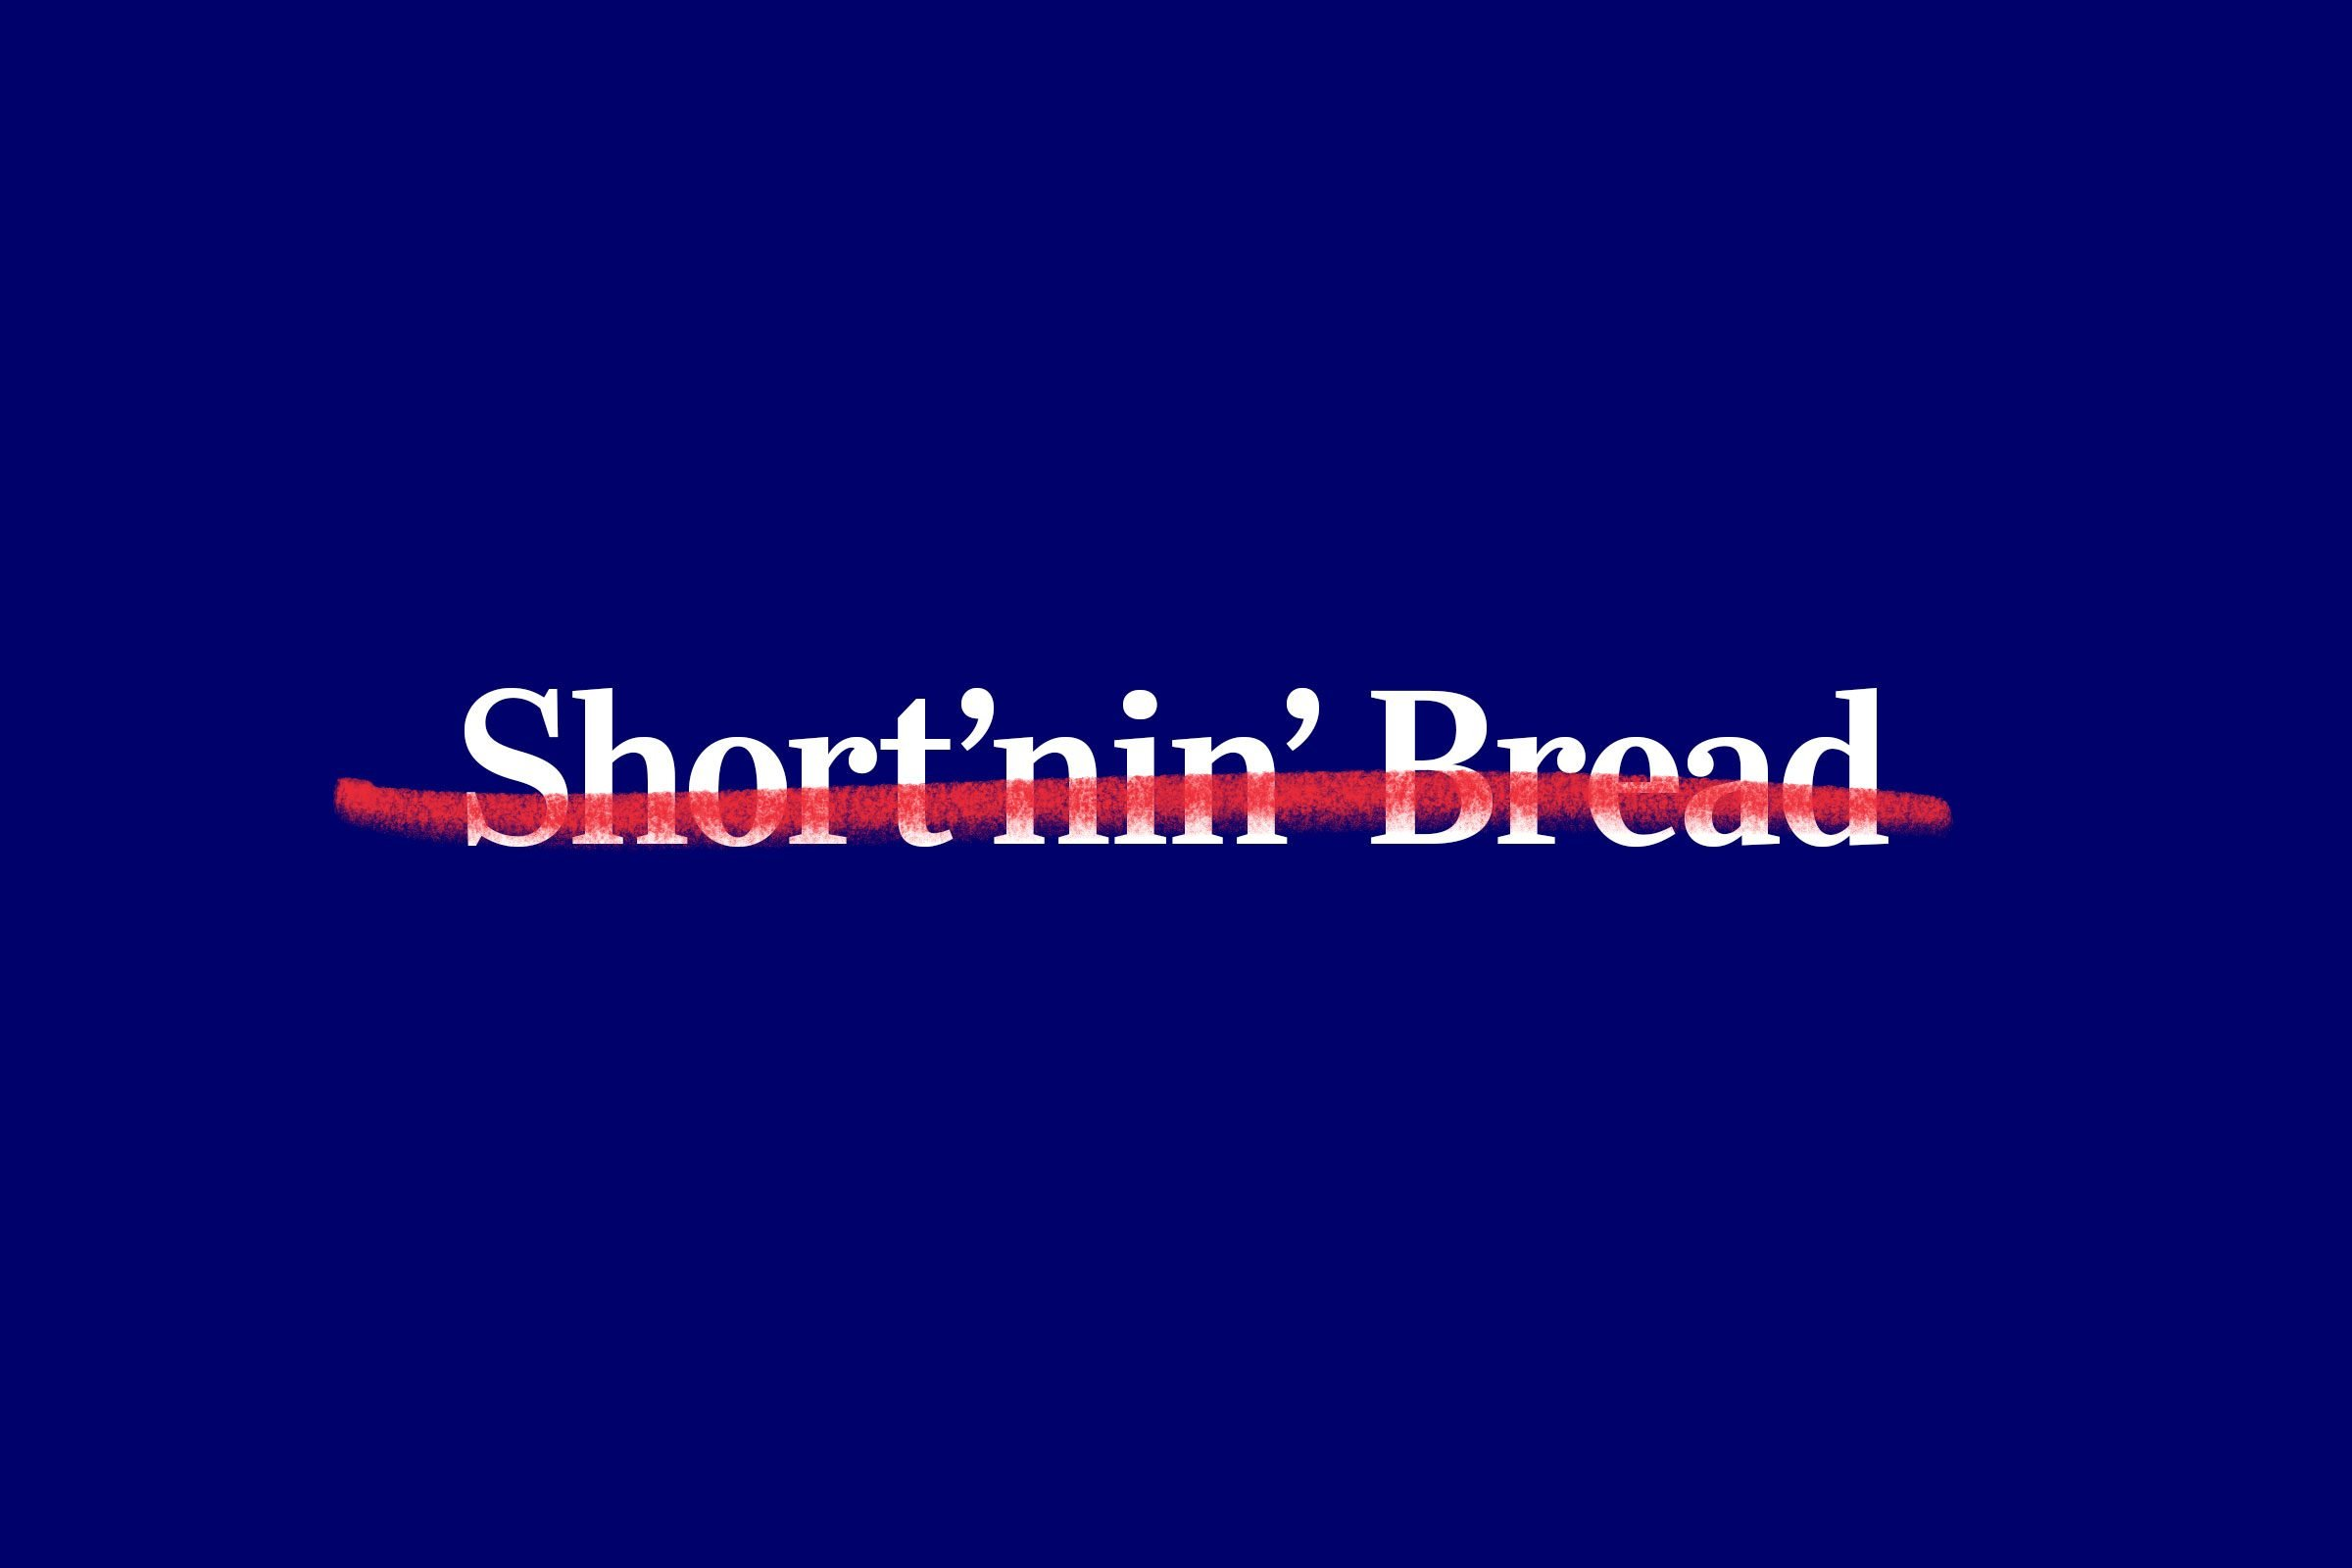 nursery rhyme title (Short'nin' Bread) with red strikethrough overlay